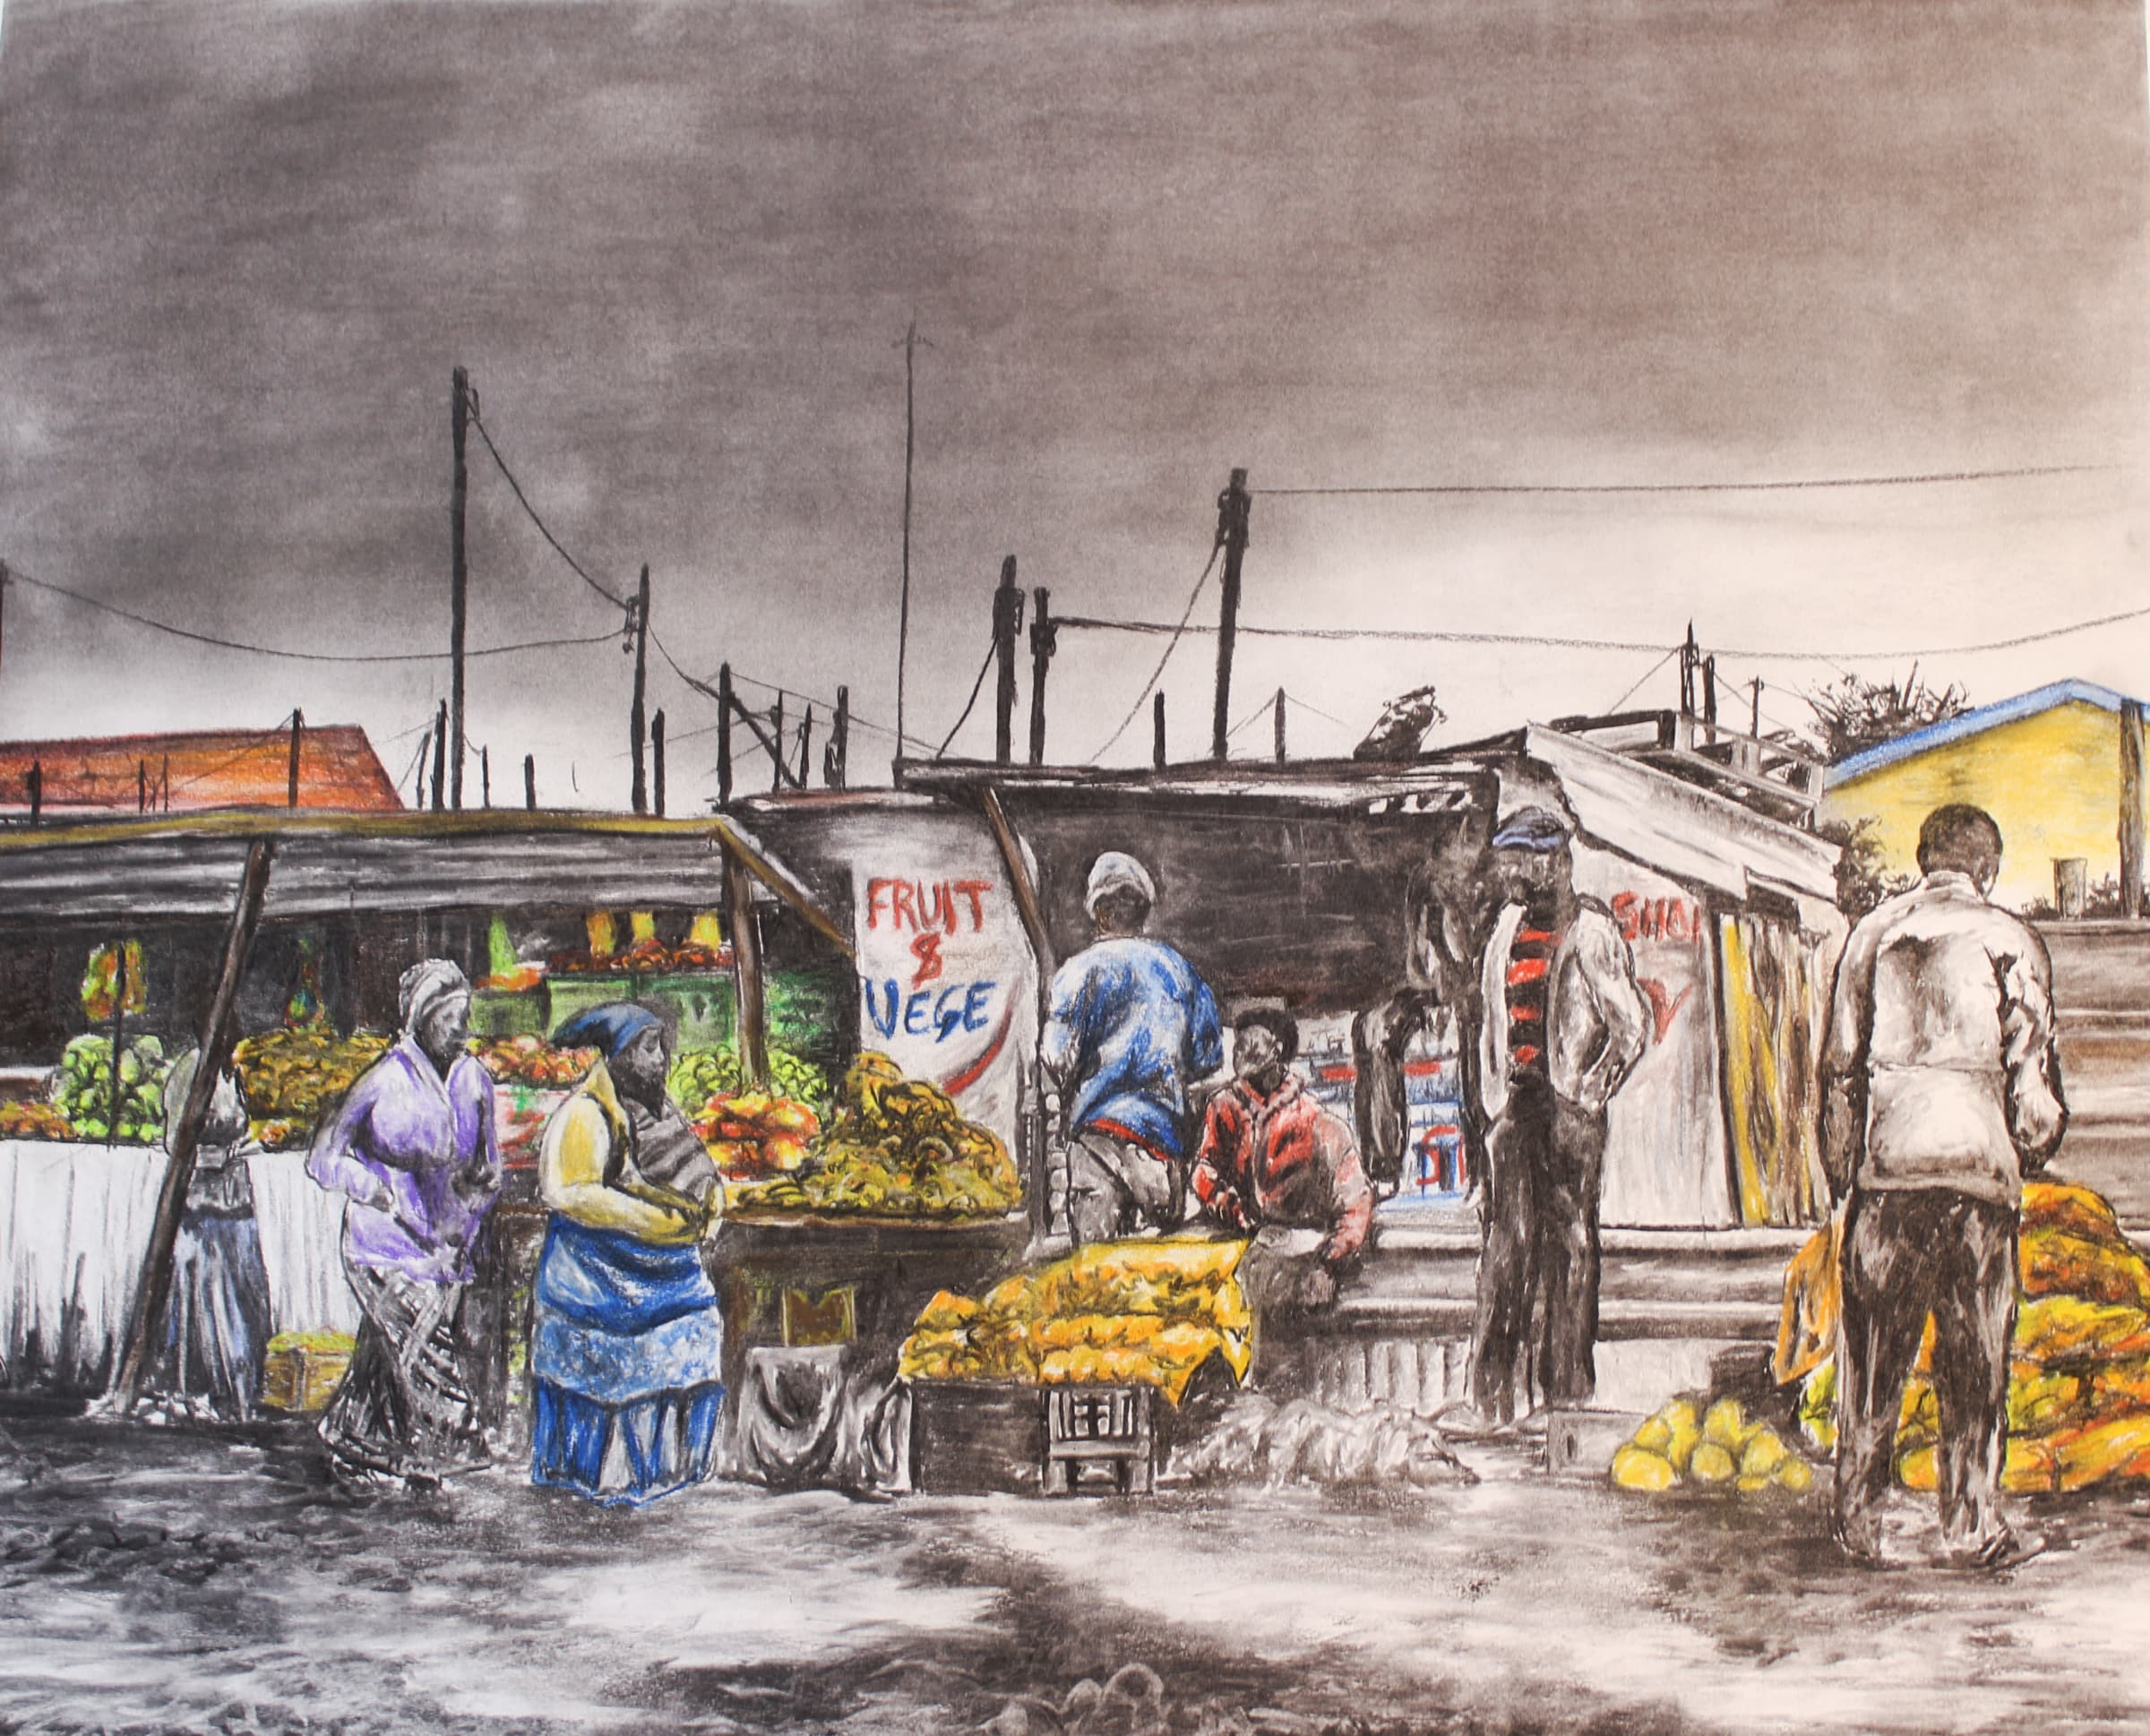 <span class=&#34;link fancybox-details-link&#34;><a href=&#34;/artists/98-walter-fumani-maluleke/works/1573-walter-fumani-maluleke-village-street-market-i-2018/&#34;>View Detail Page</a></span><div class=&#34;artist&#34;><strong>Walter Fumani Maluleke </strong></div> <div class=&#34;title&#34;><em>Village Street Market I</em>, 2018</div> <div class=&#34;medium&#34;>Charcoal On Fabriano</div> <div class=&#34;dimensions&#34;>118.5cm x 84.5cm (137cm x 102.5cm framed)</div><div class=&#34;price&#34;>R12,000.00</div>